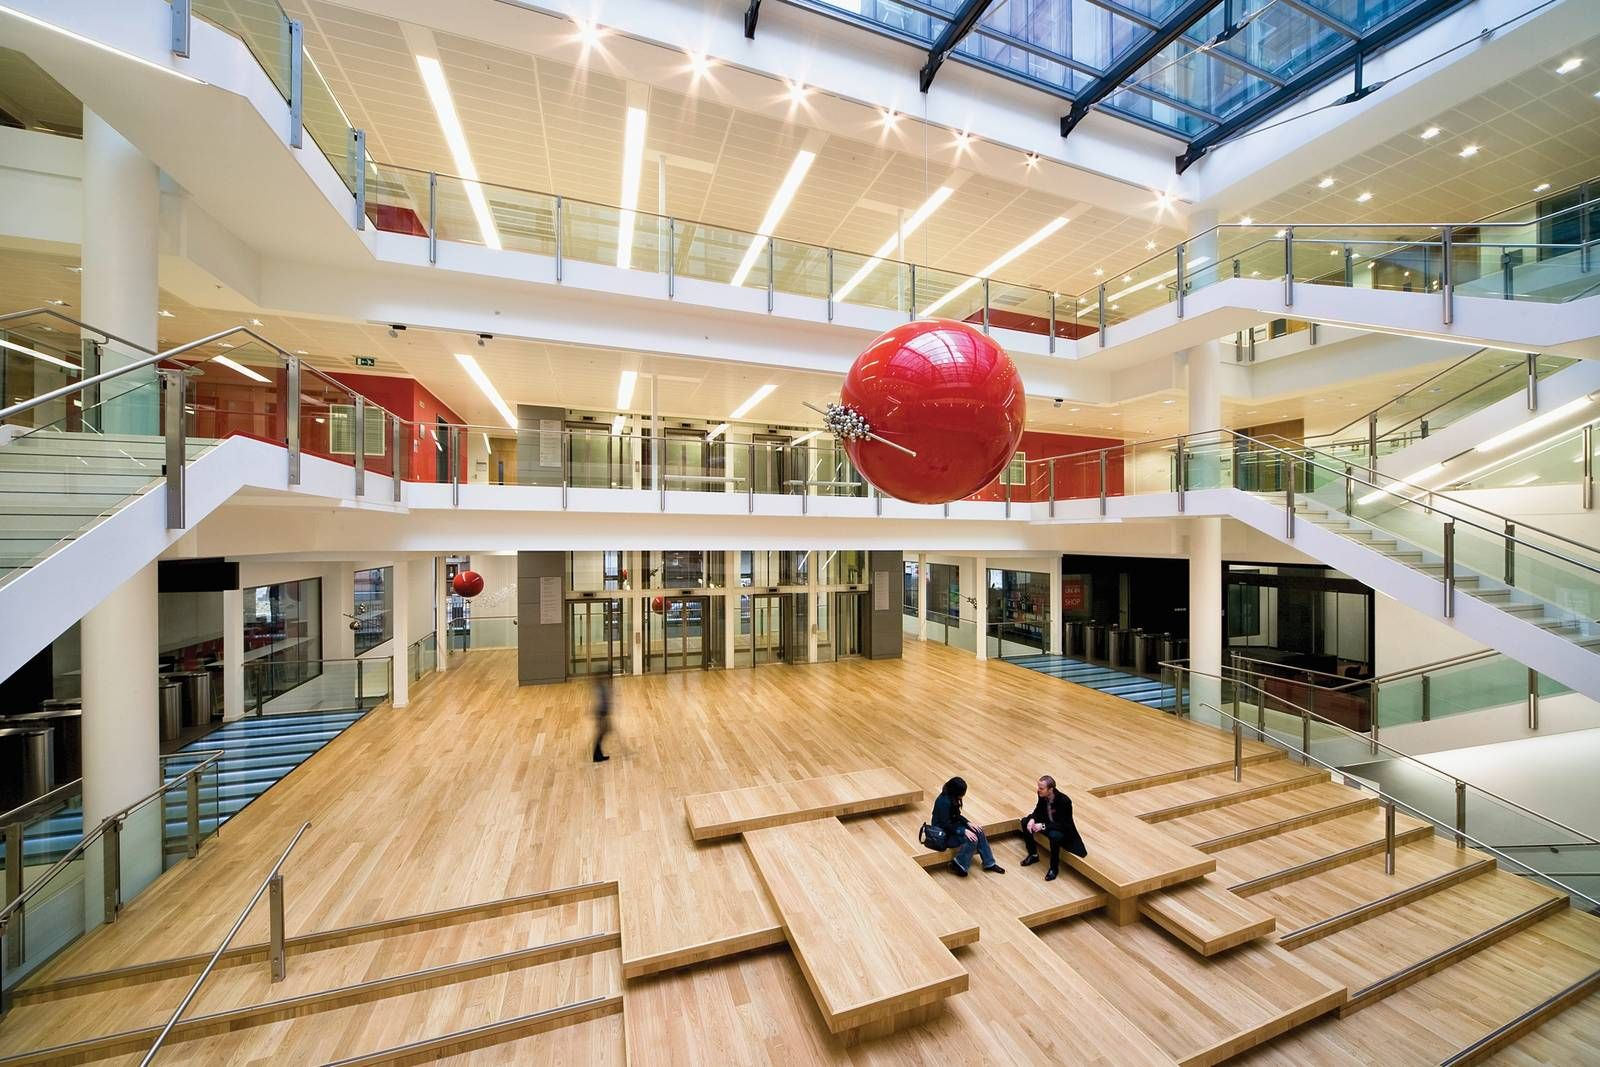 London school of economics new academic building projects grimshaw architects